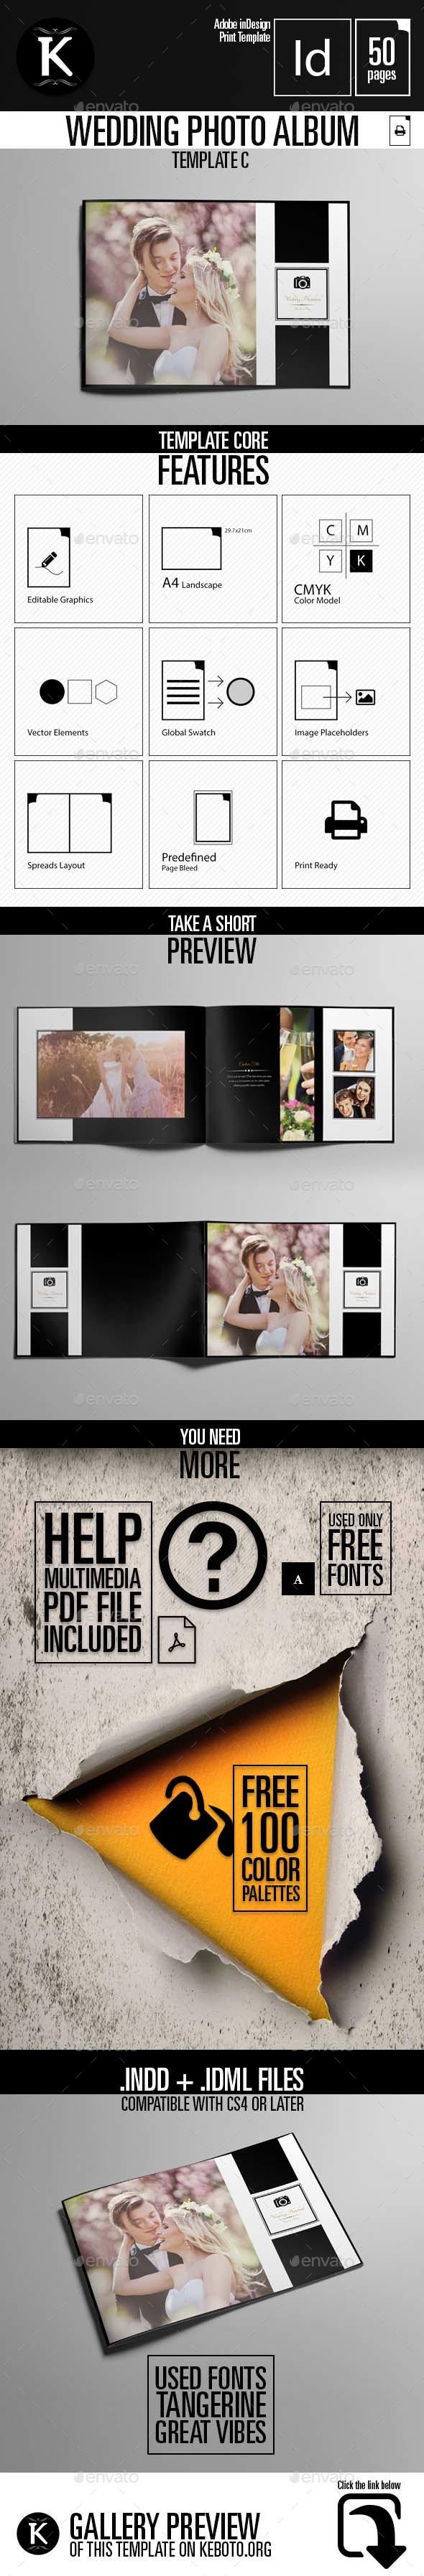 Wedding Photo Album Template C | Pinterest